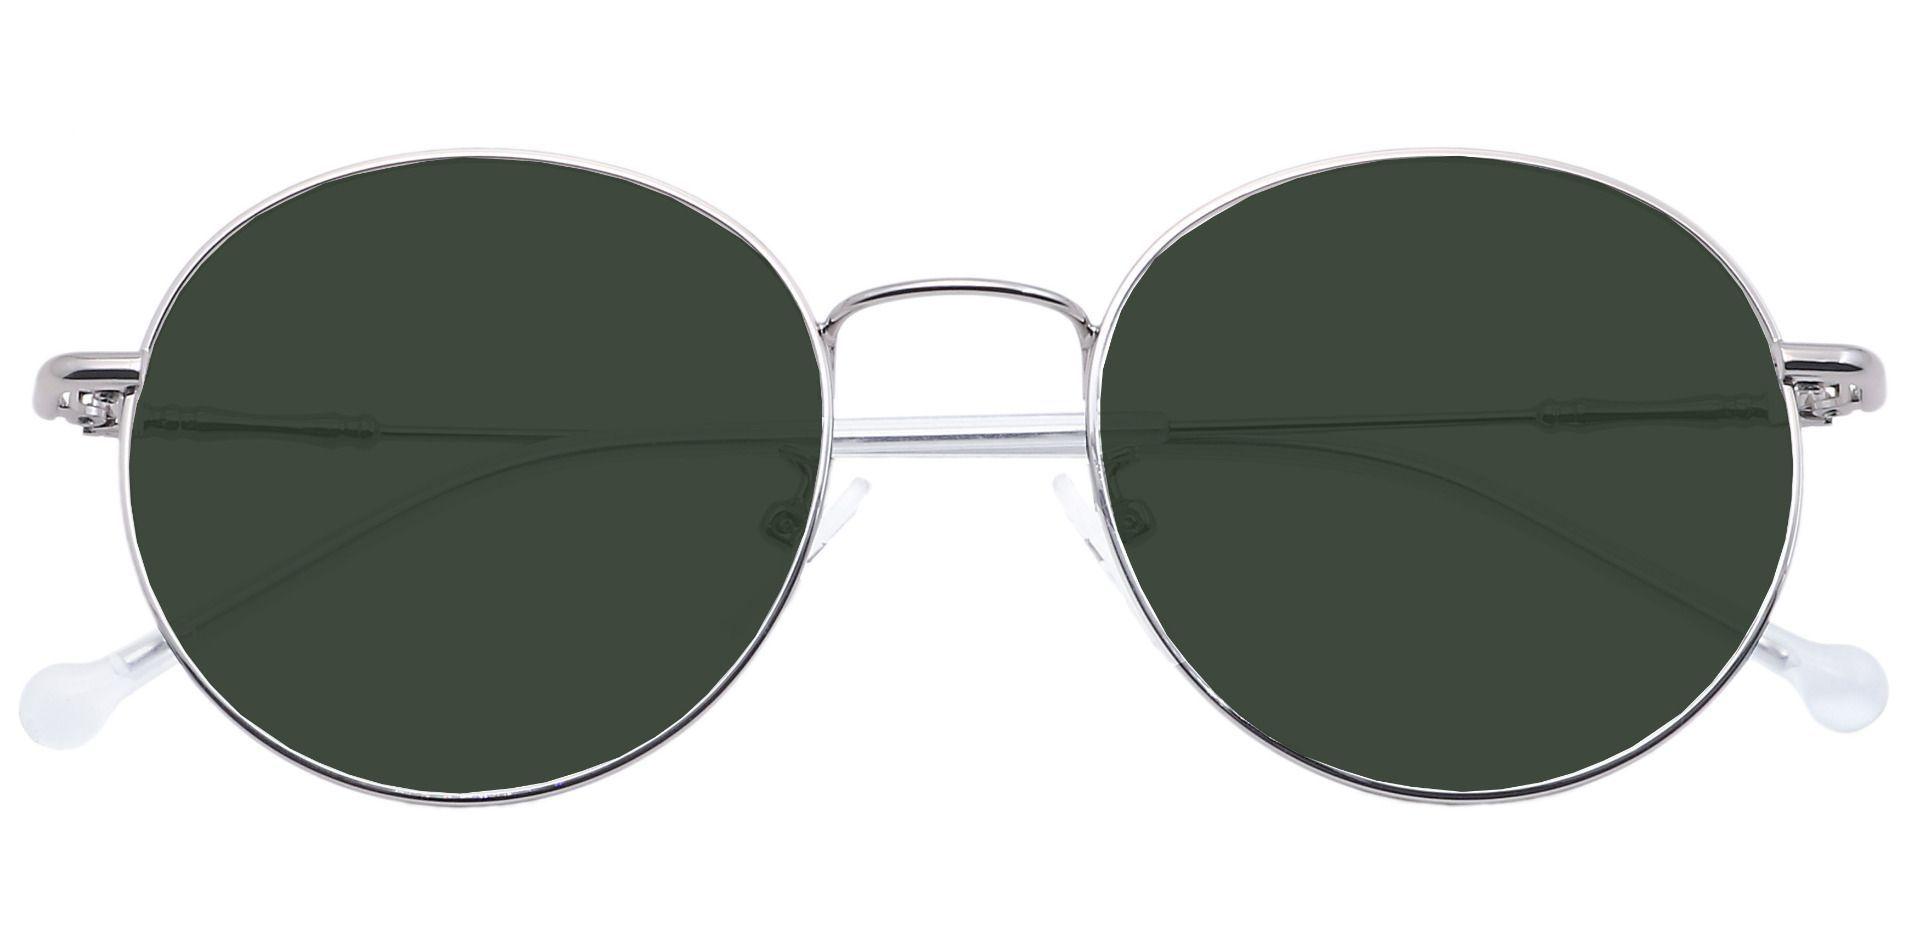 Magnus Round Prescription Sunglasses - Gray Frame With Green Lenses